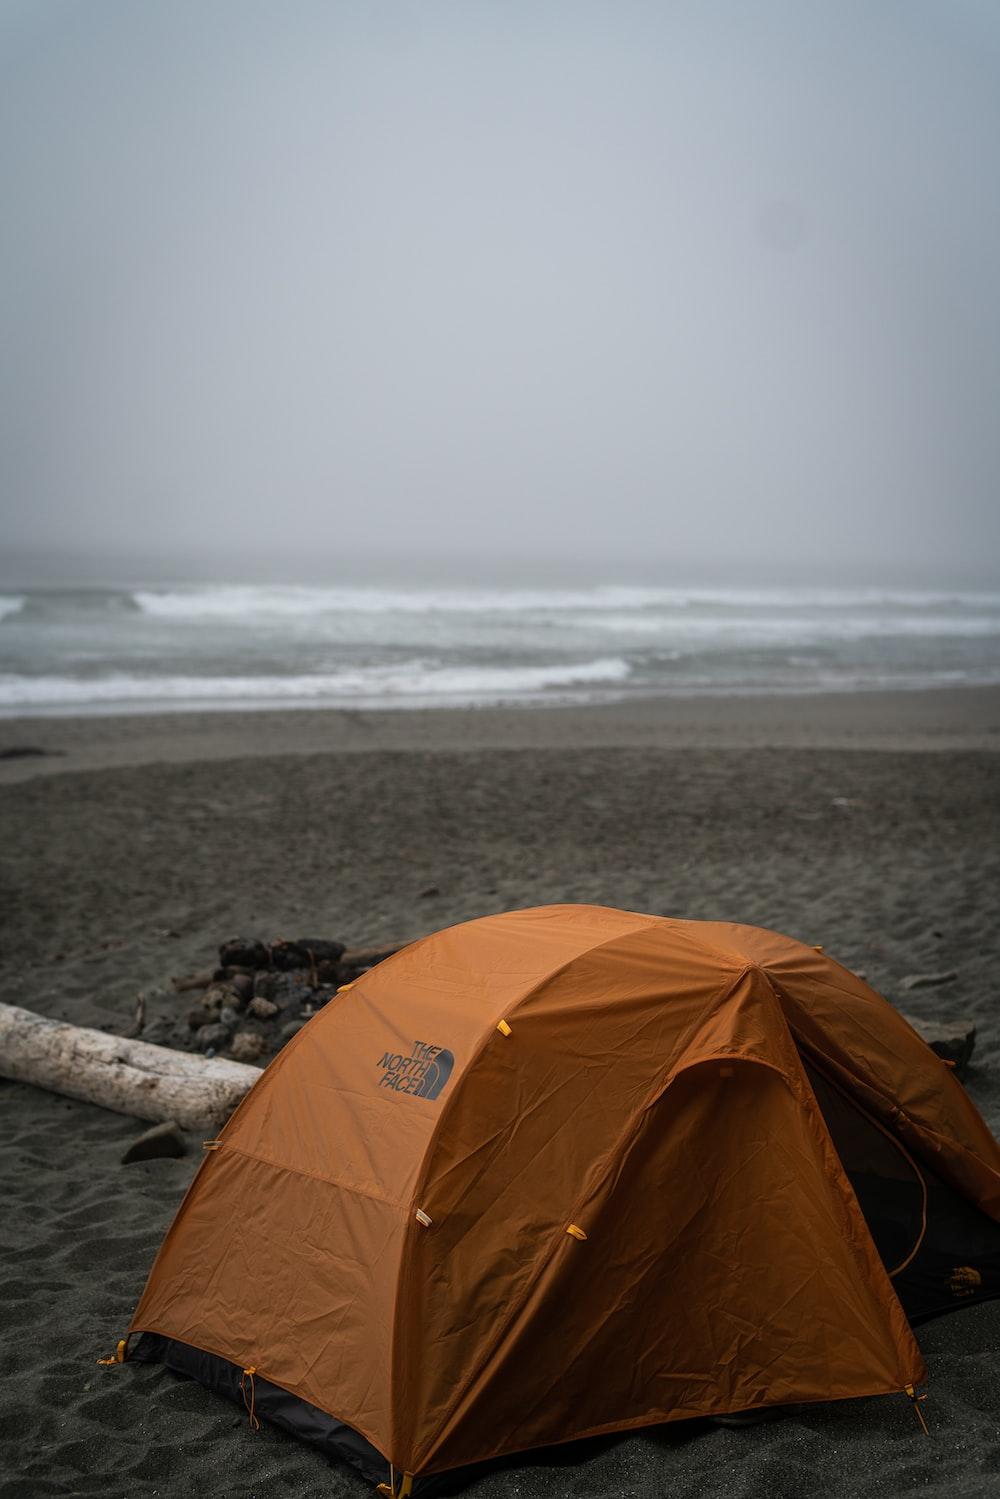 orange tent on sand near seashore